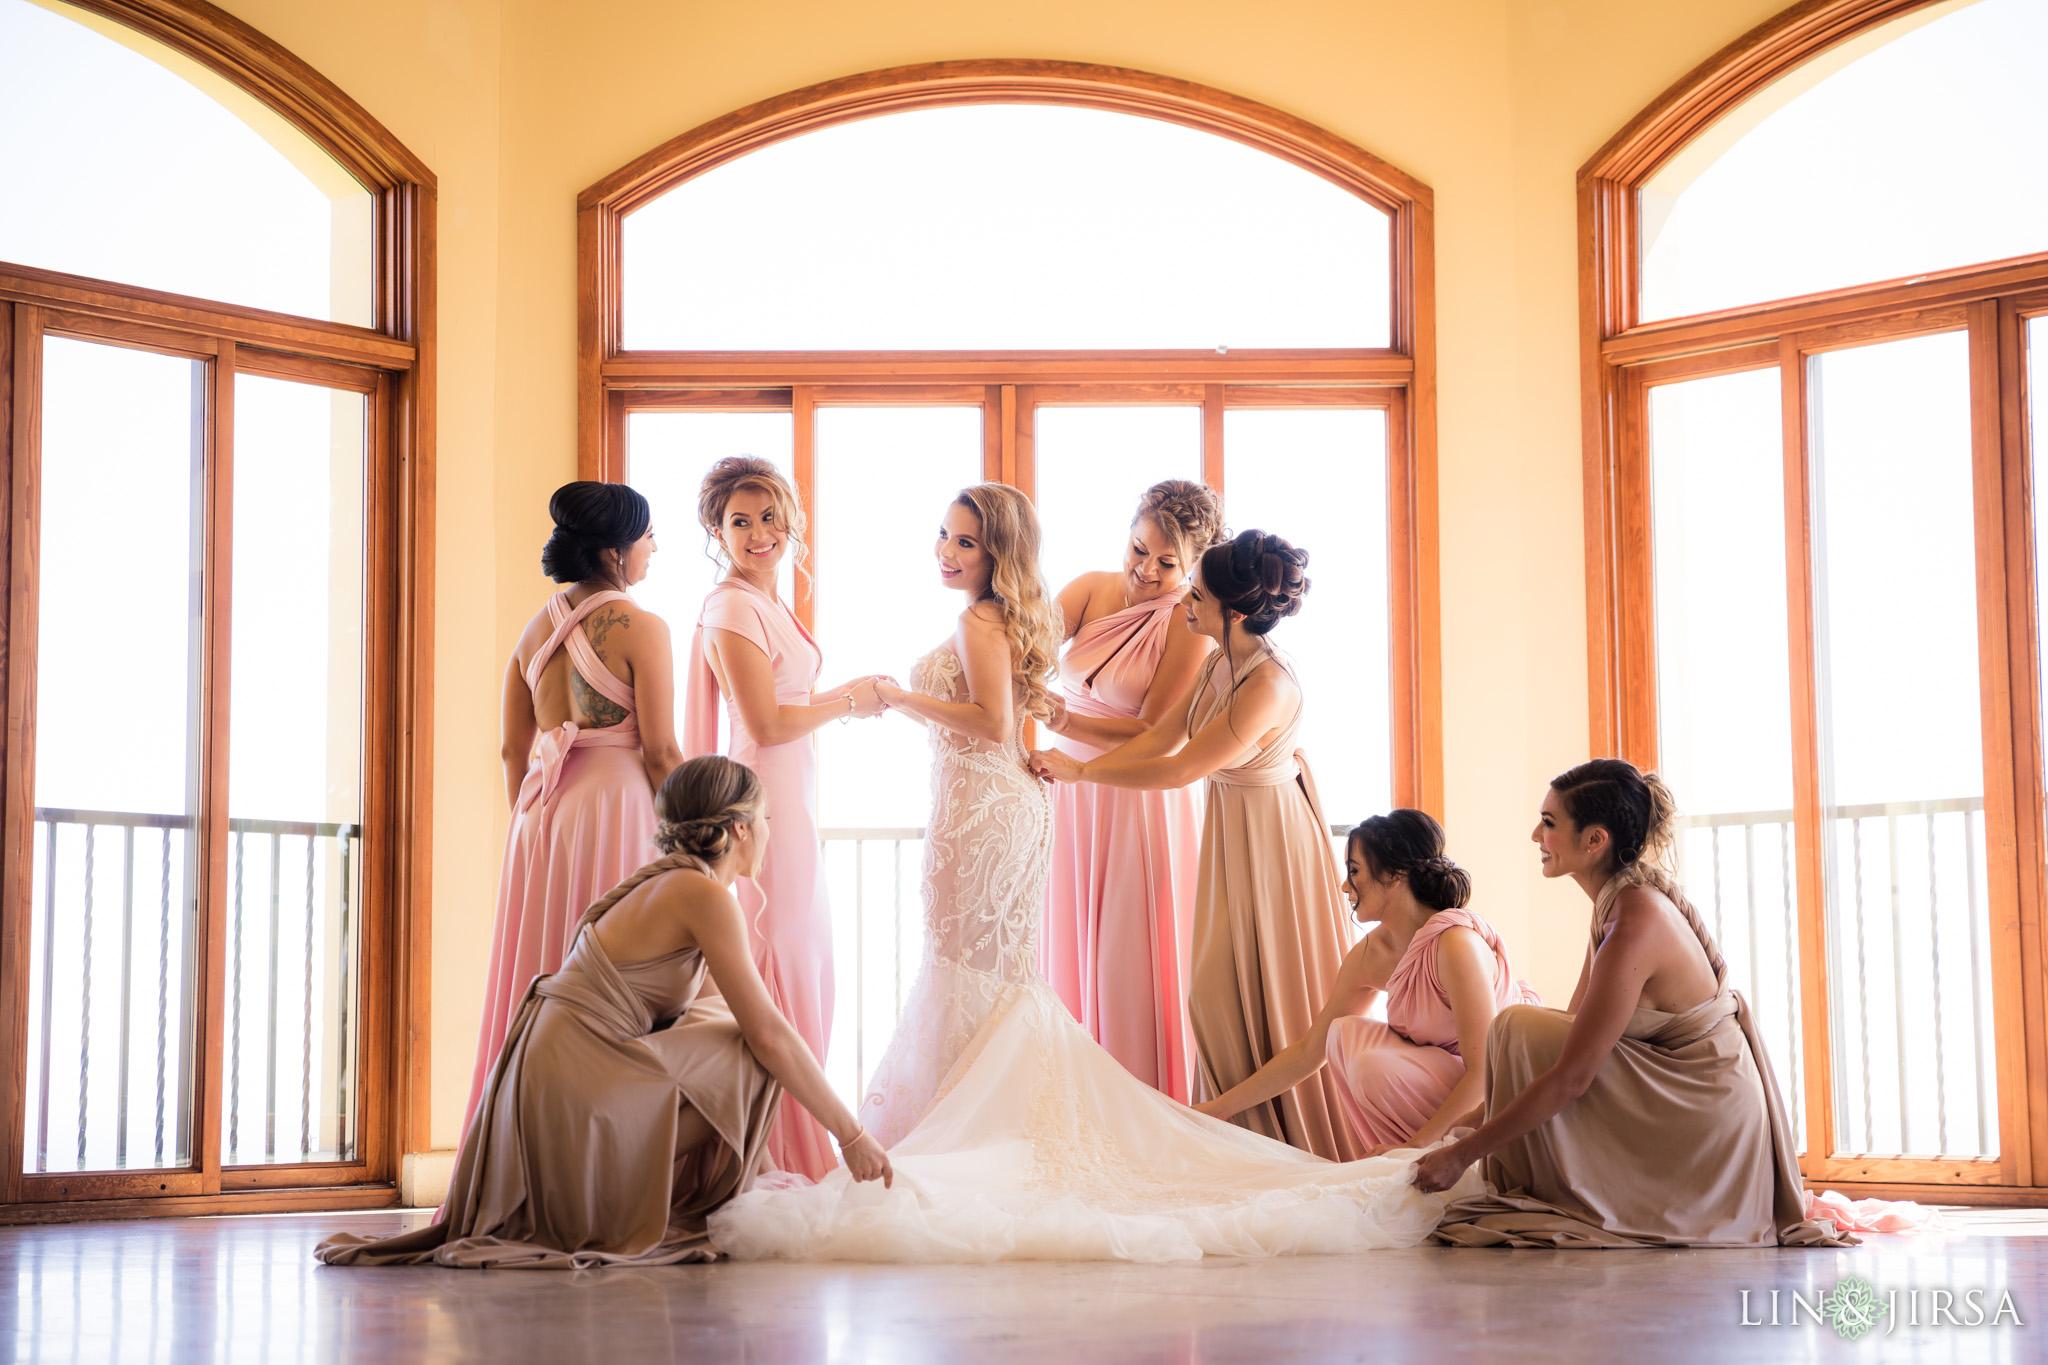 04 trump national golf club palos verdes bridesmaids wedding photography